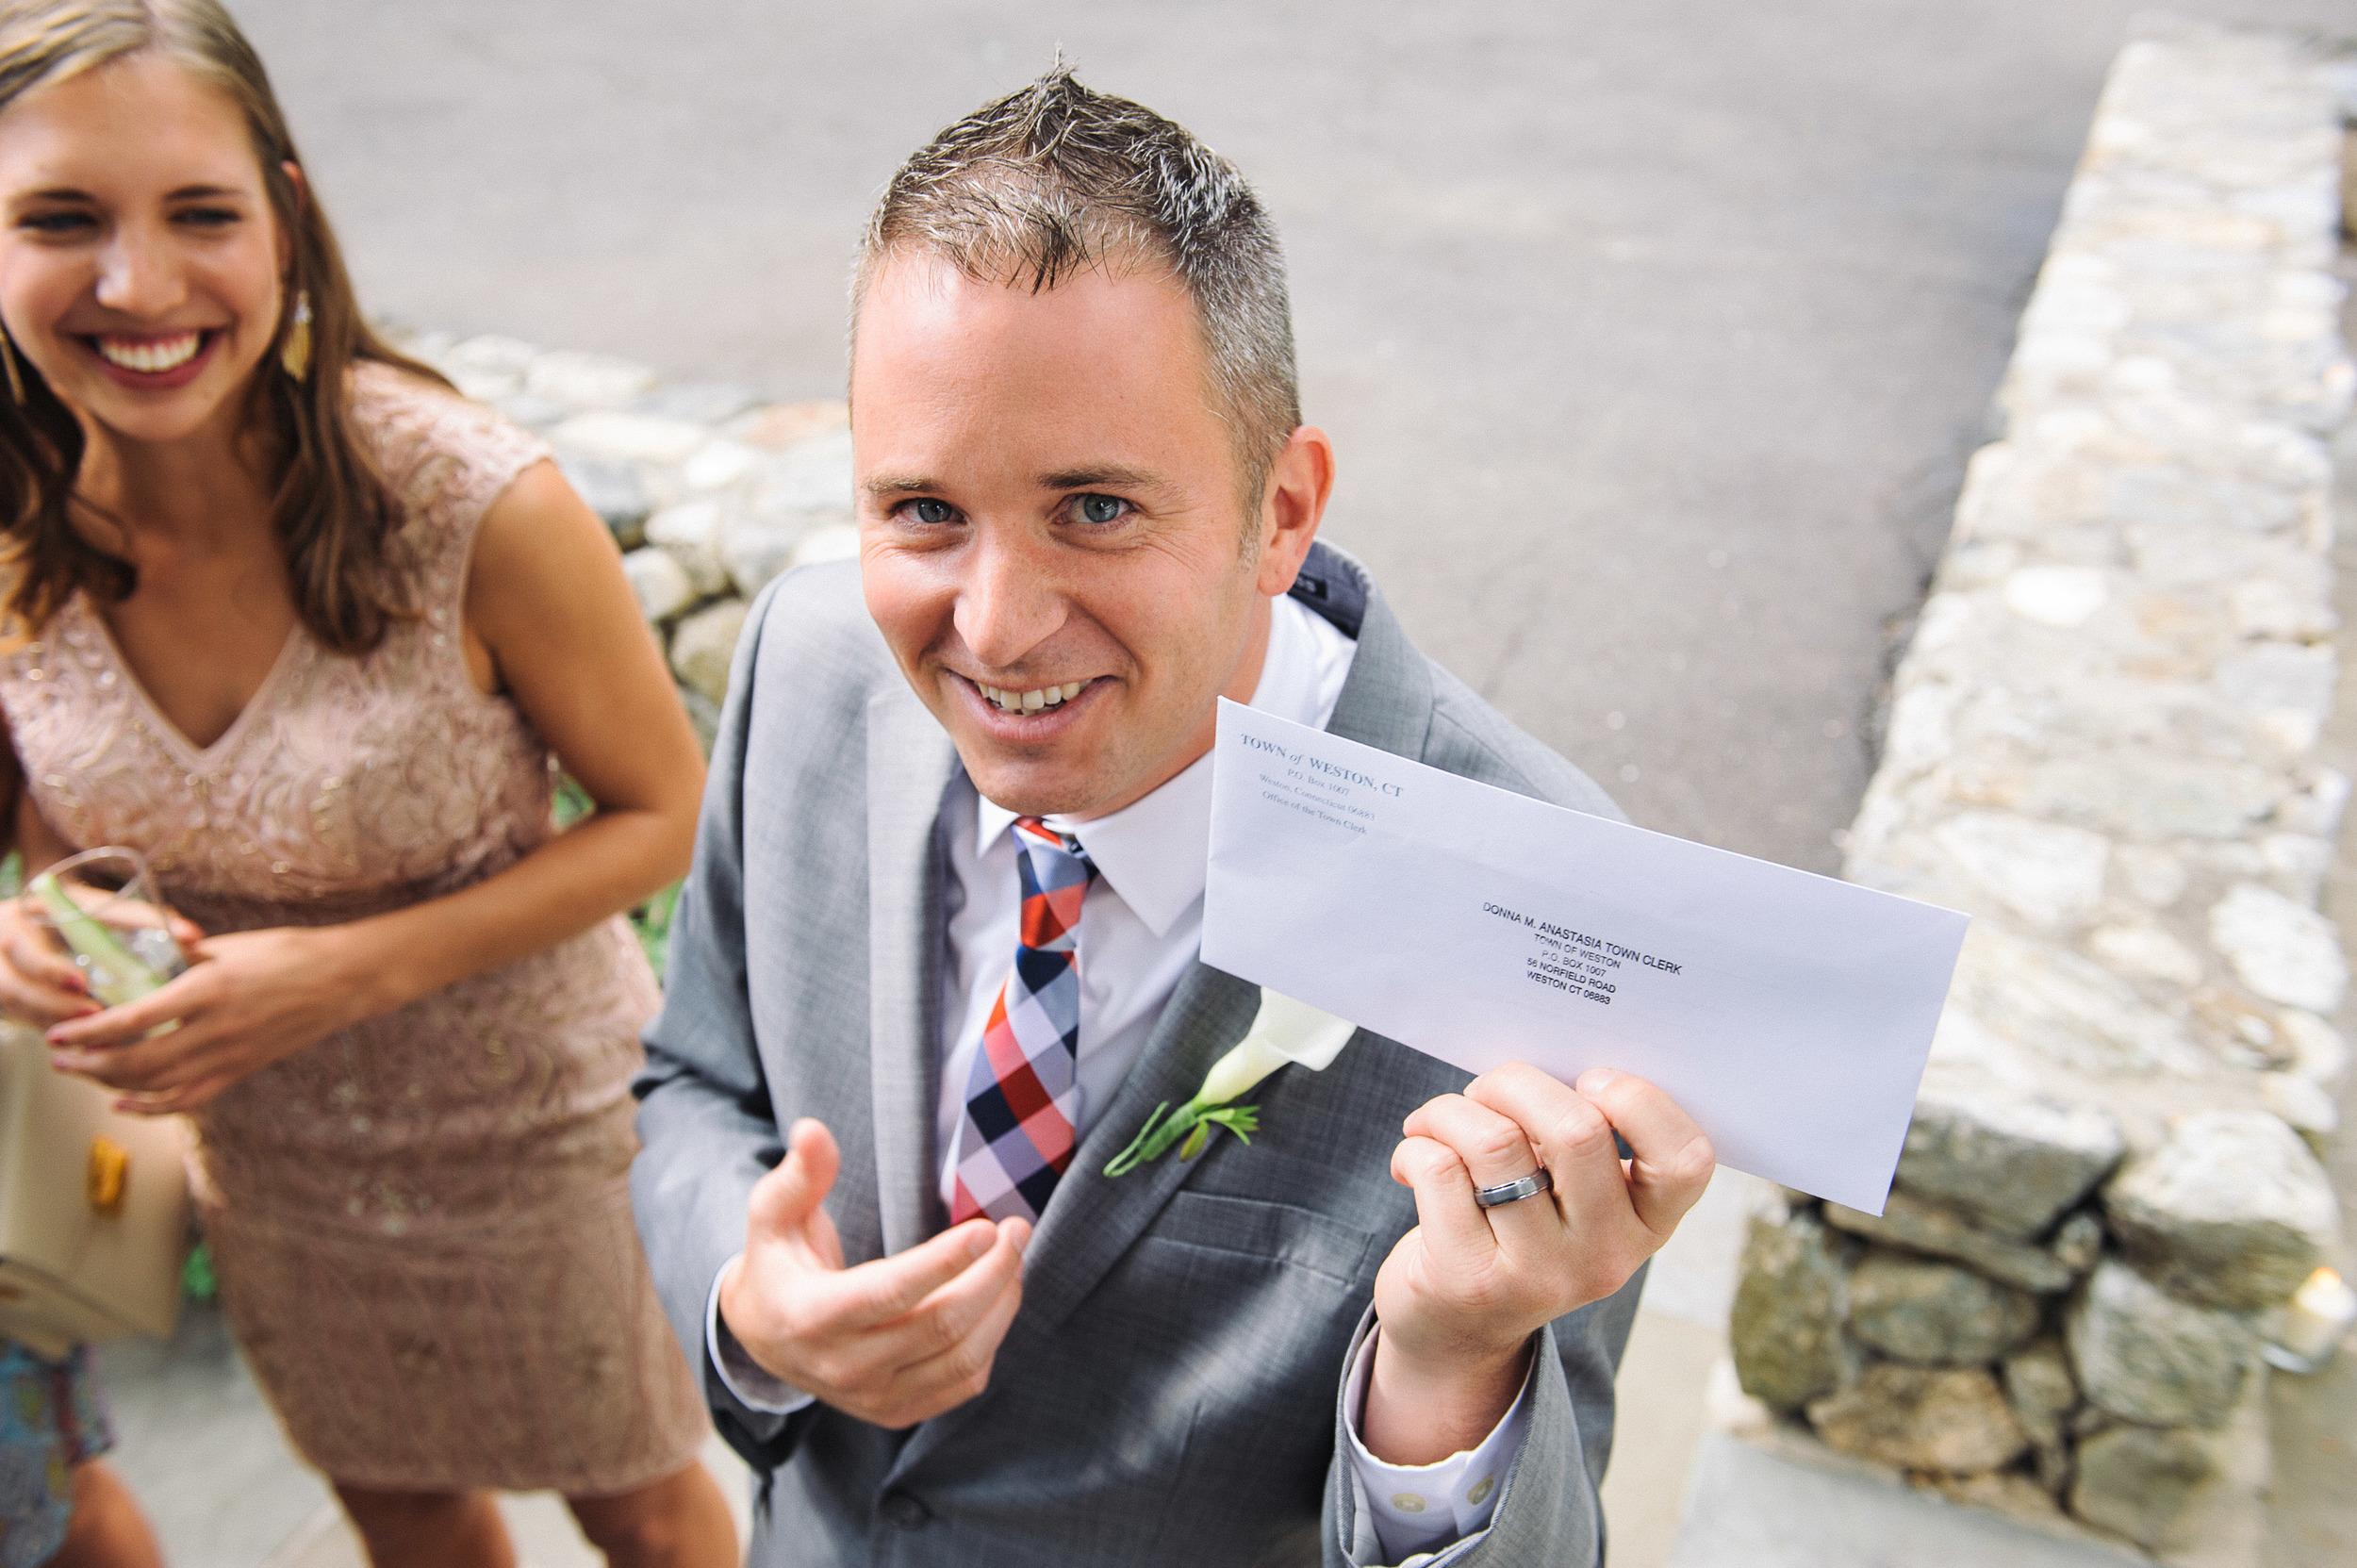 Same Sex Wedding CT Gay Wedding LGBT Wedding029.JPG